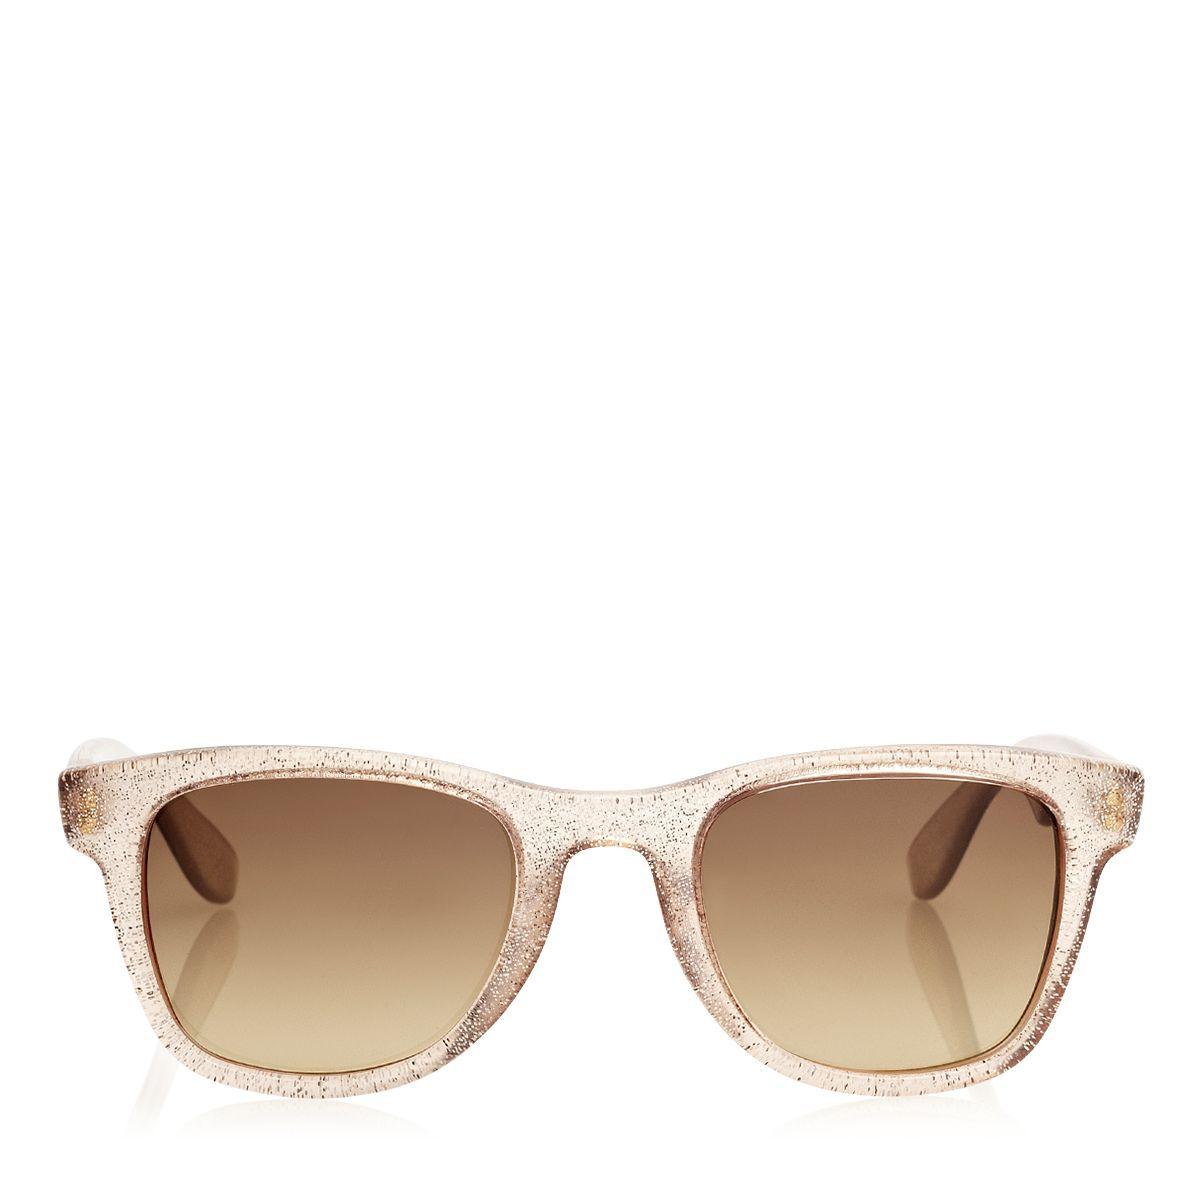 cebbb5adeb6 Carrera Nude Glitter Carrera 6000 Sunglasses by  Jimmy Choo  Jimmy Choo (US)